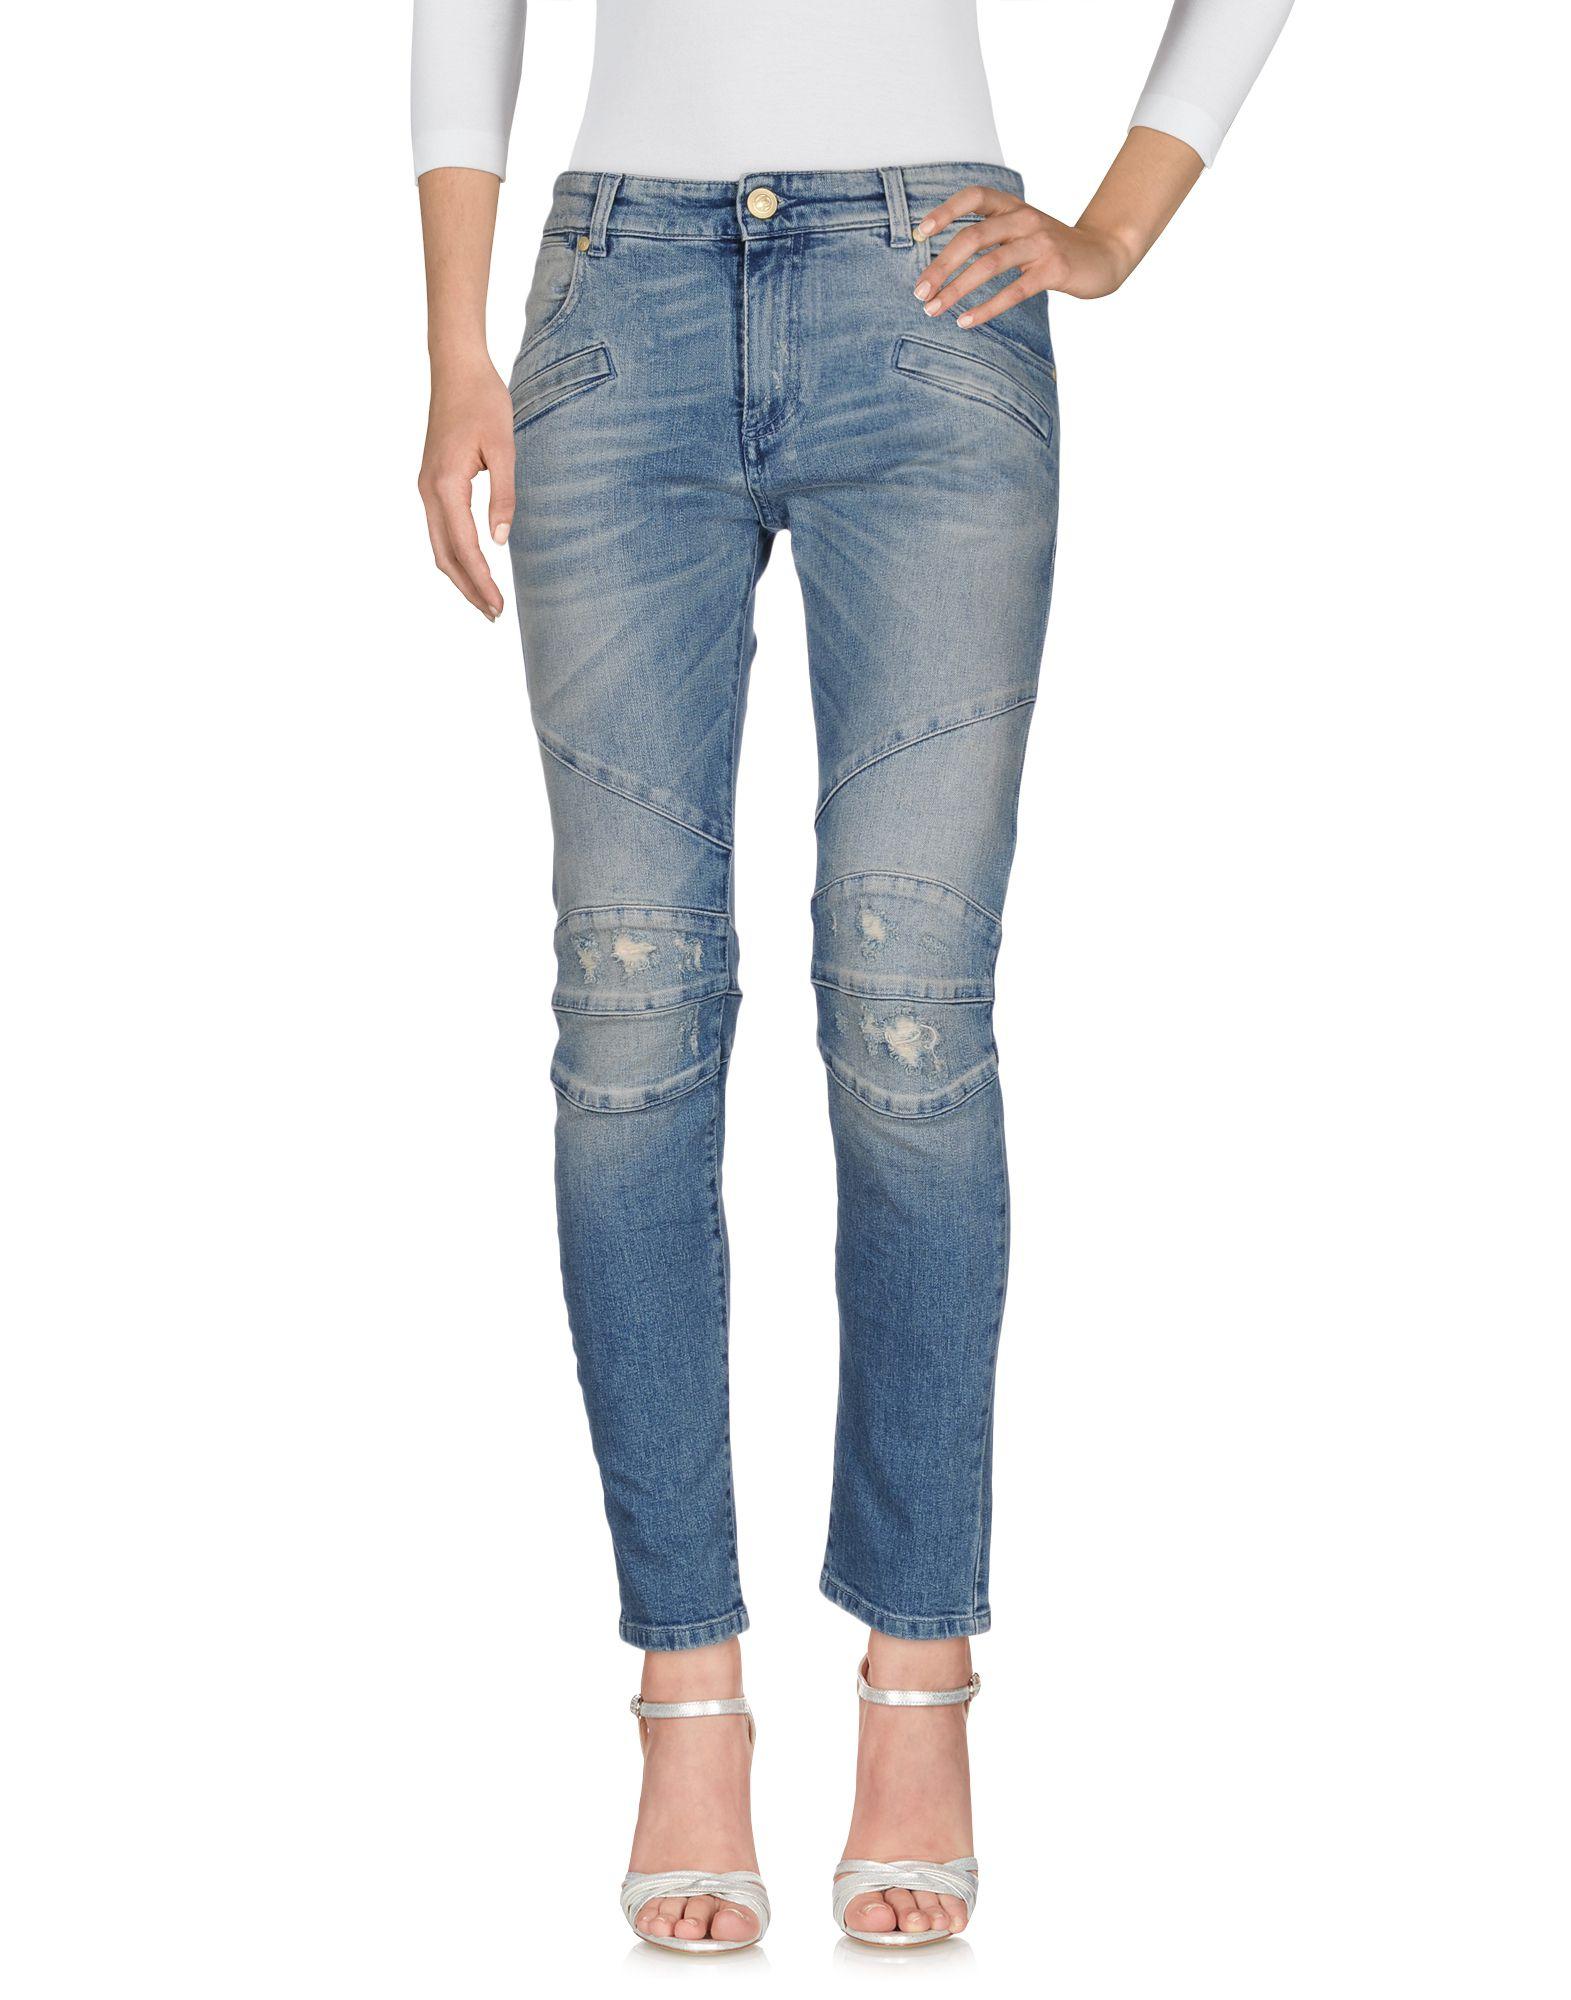 Pantaloni Jeans Pierre Balmain Donna - Acquista online su jHrgjc8f